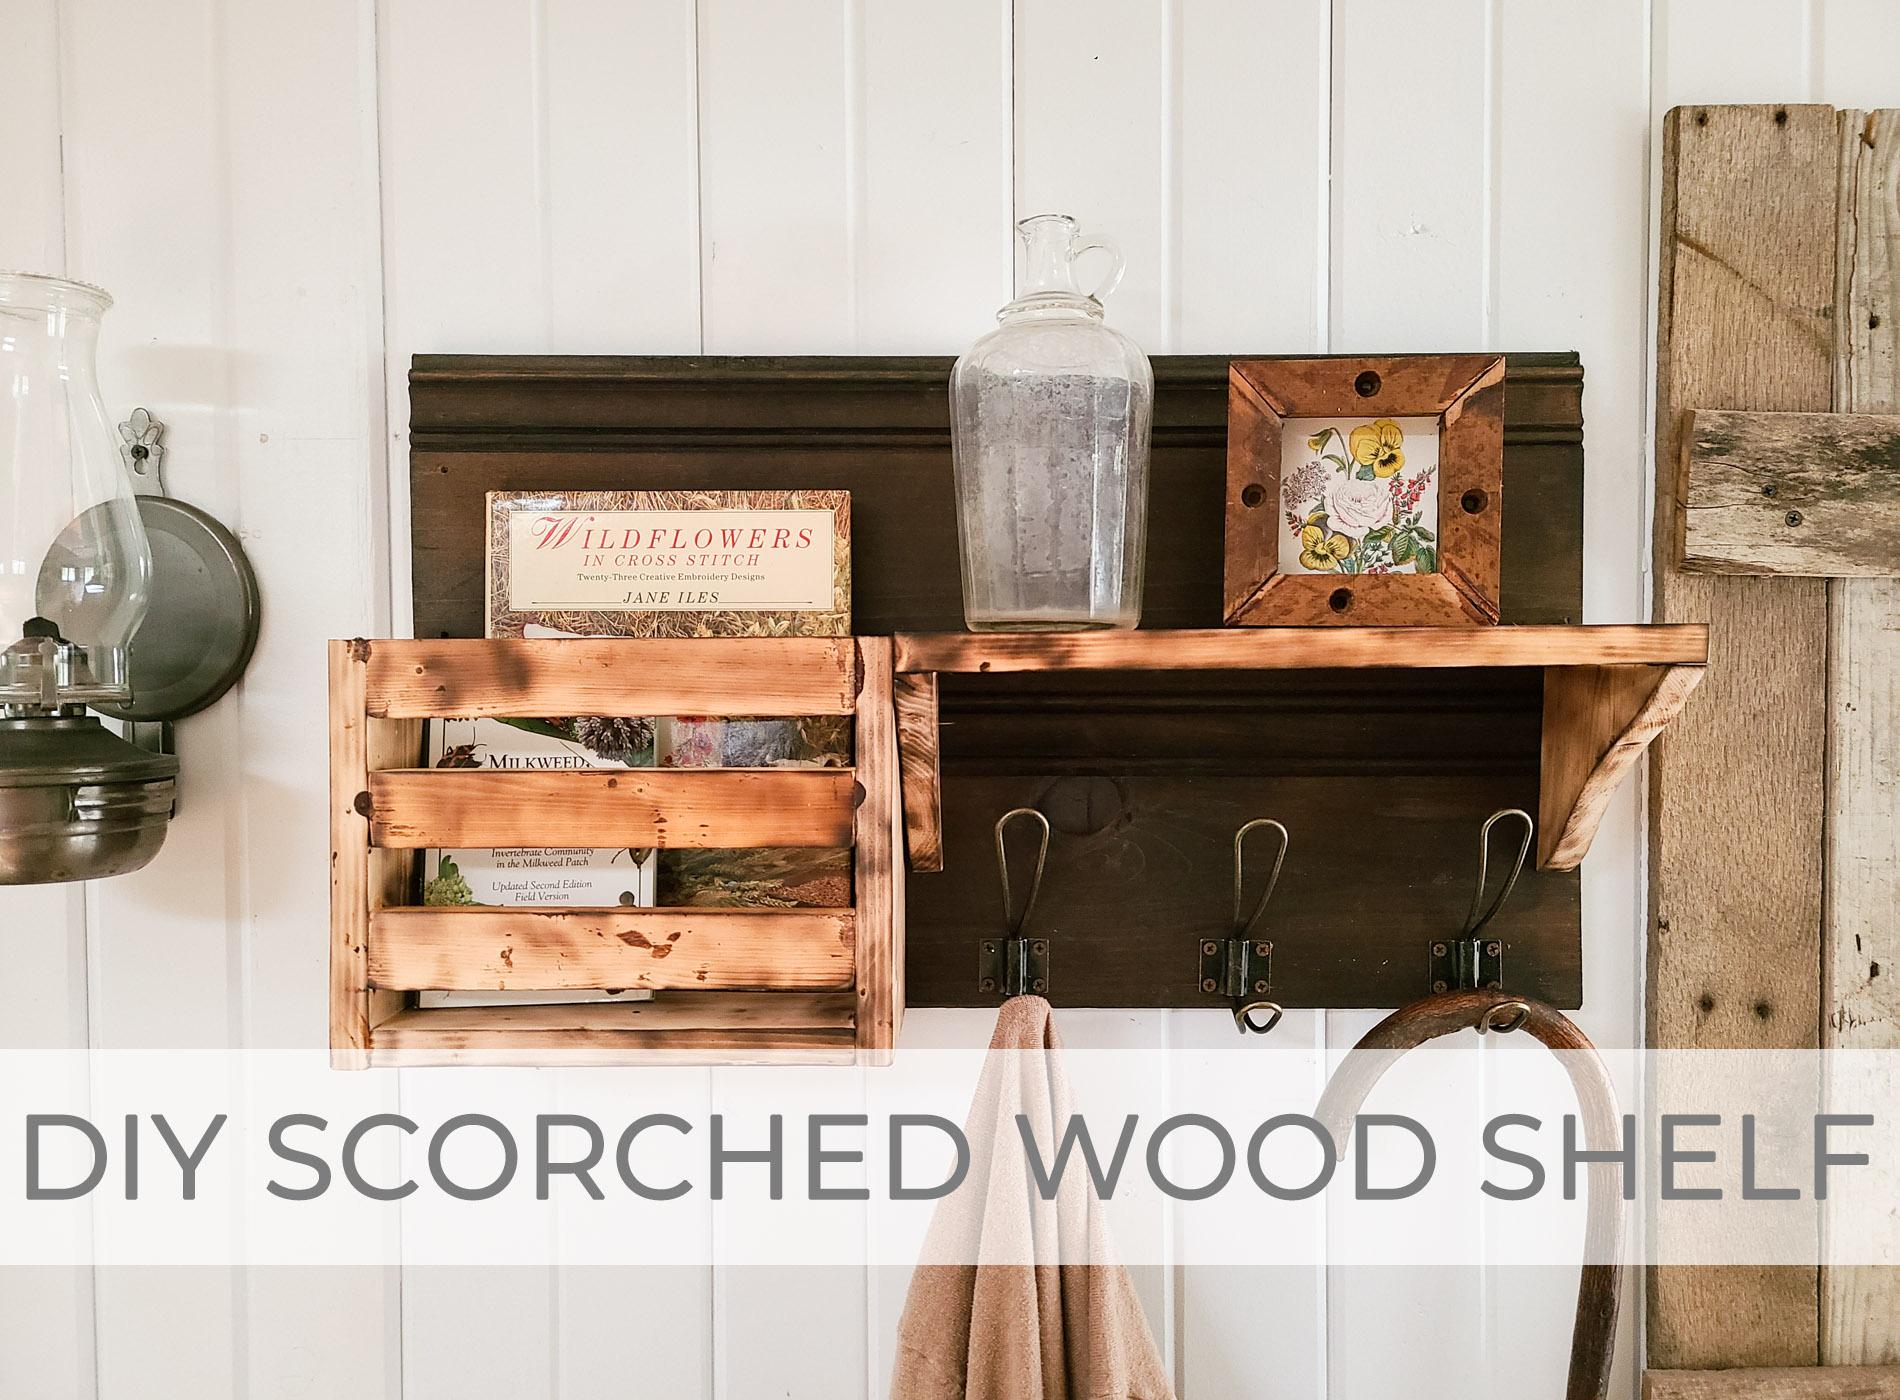 DIY Scorched Wood Shelf Tutorial by Larissa of Prodigal Pieces | prodigalpieces.com